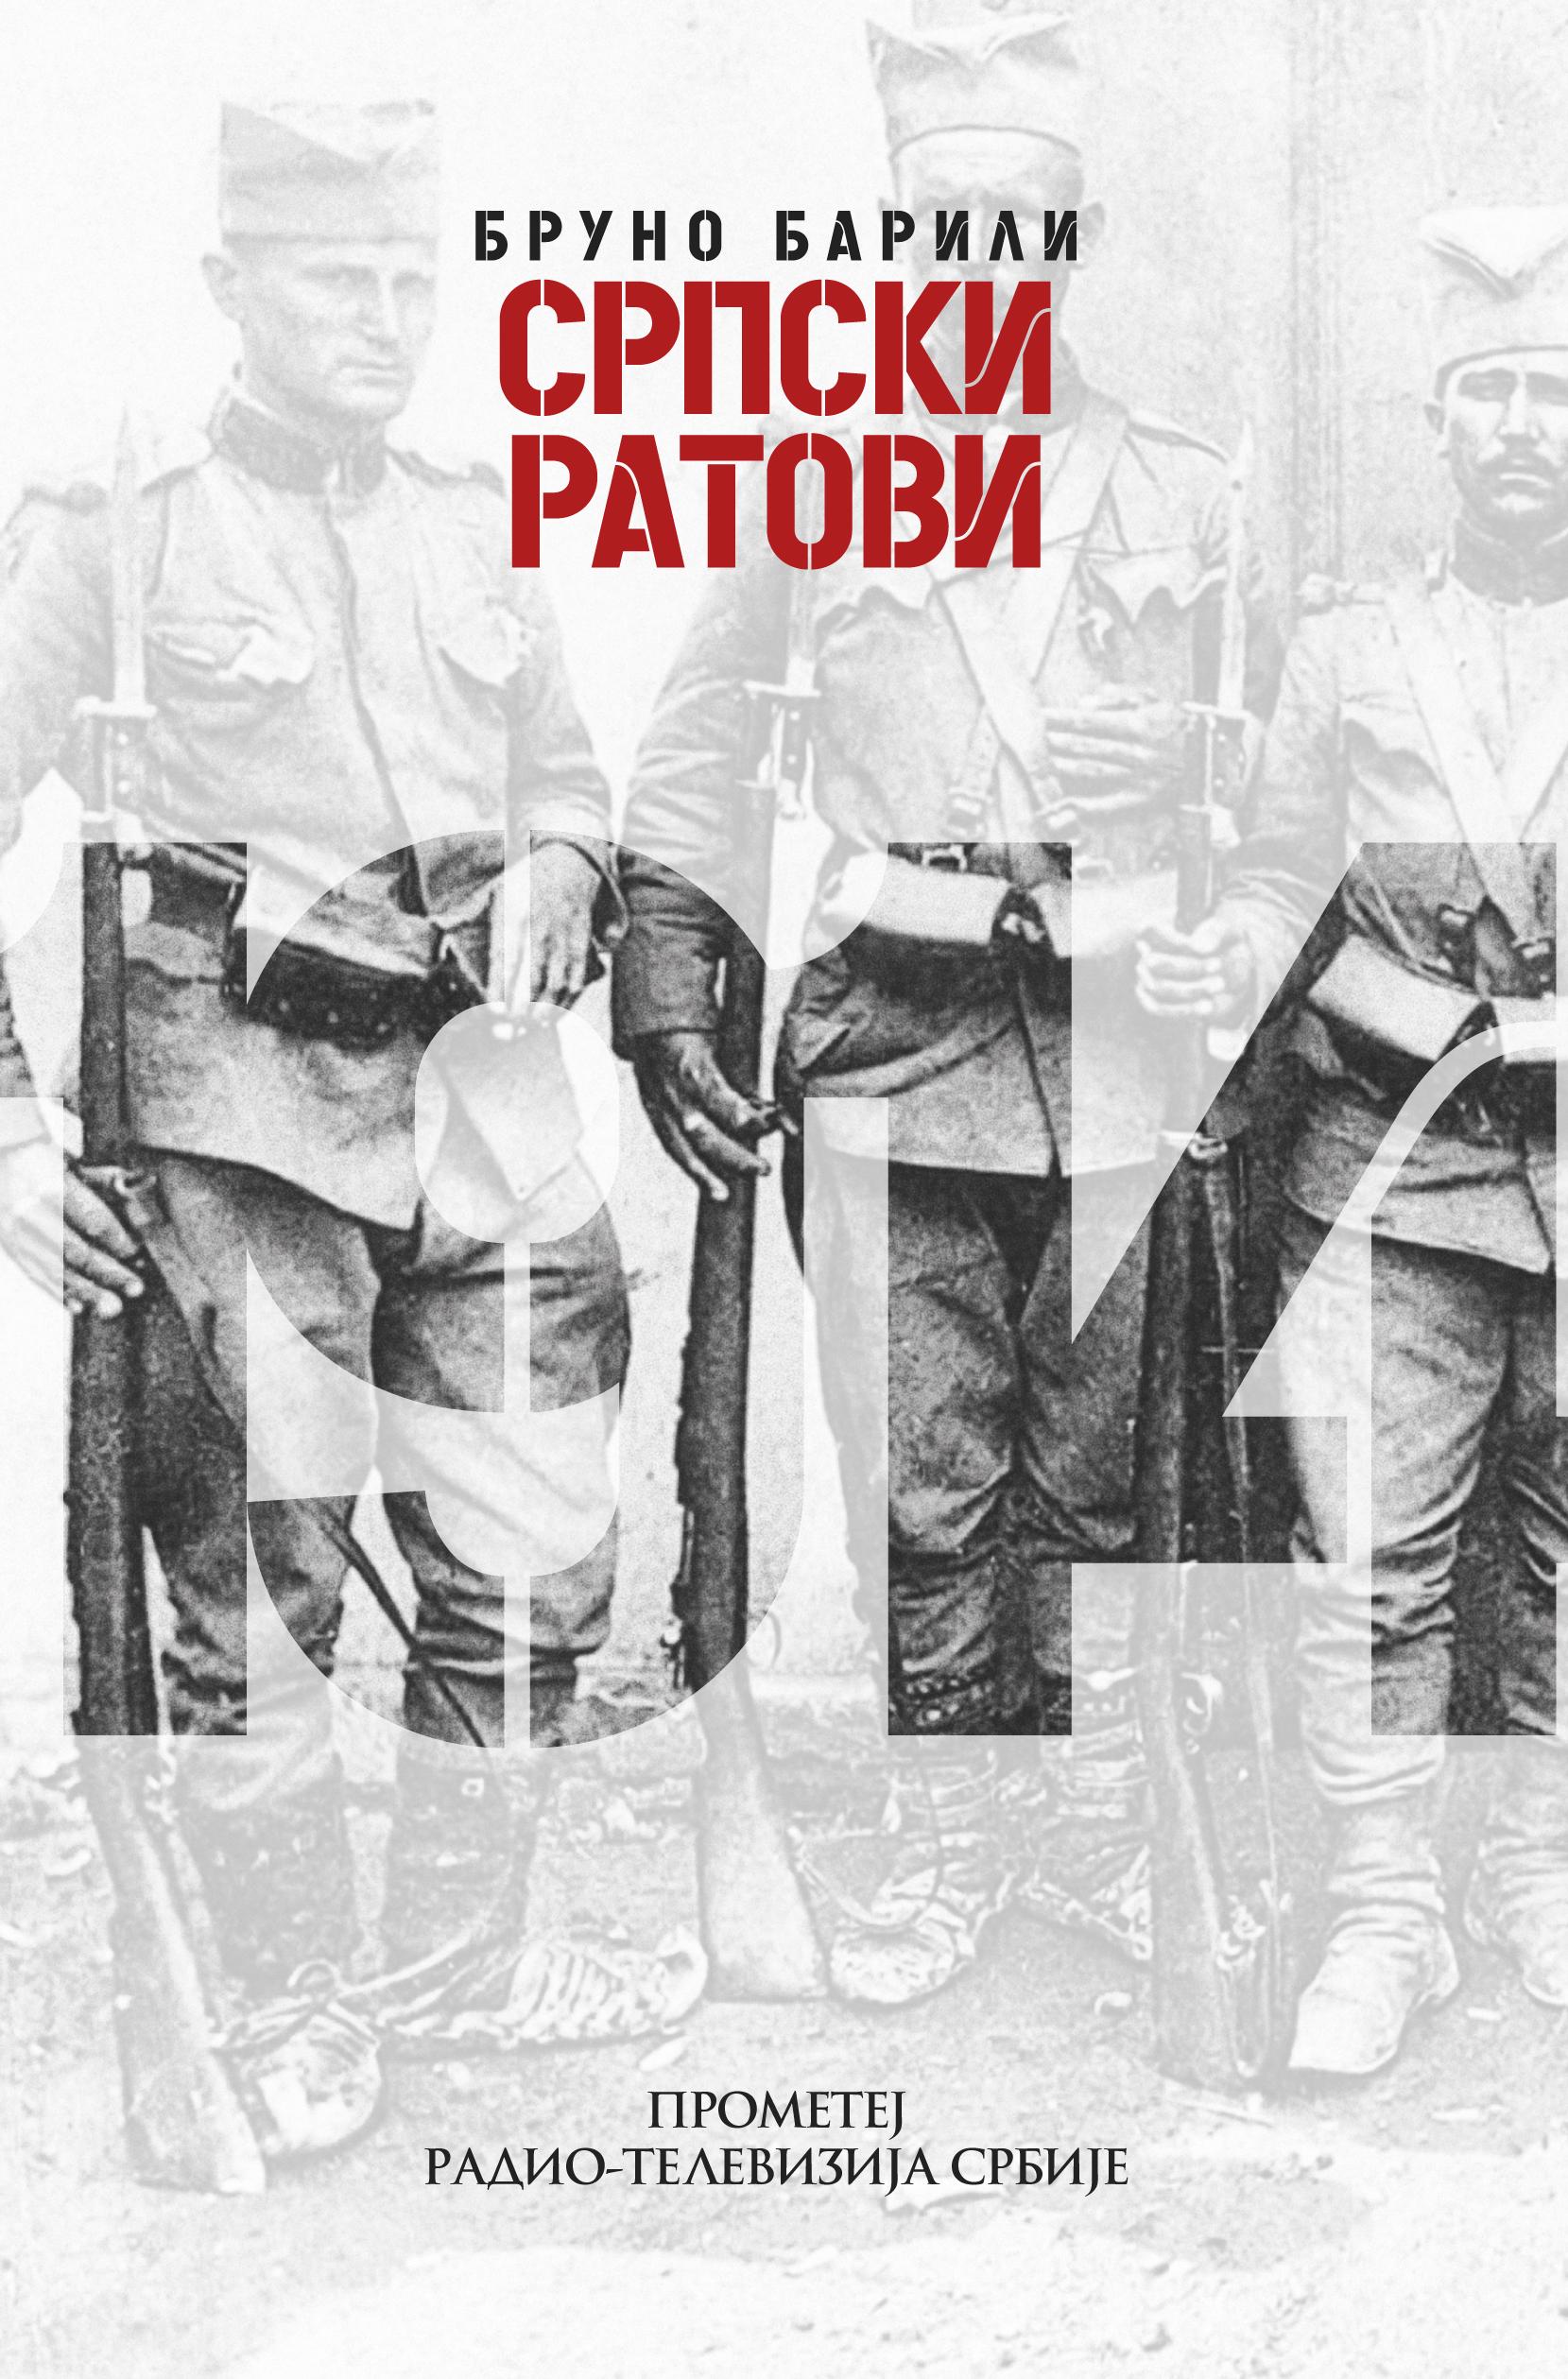 Српски ратови